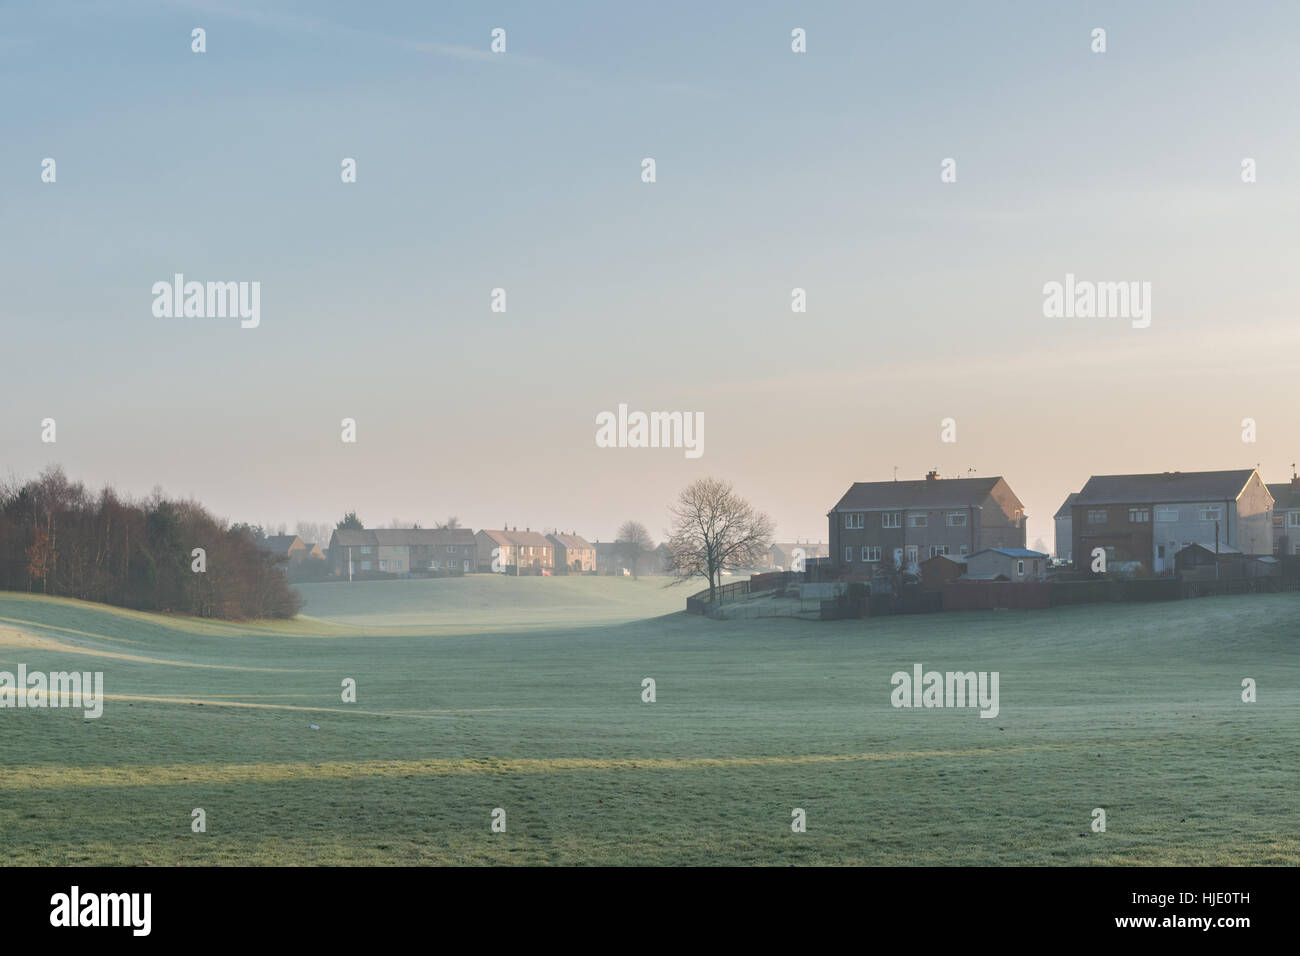 council housing next to green open space - Camelon, Camelon West ward, Falkirk, Scotland, UK - Stock Image